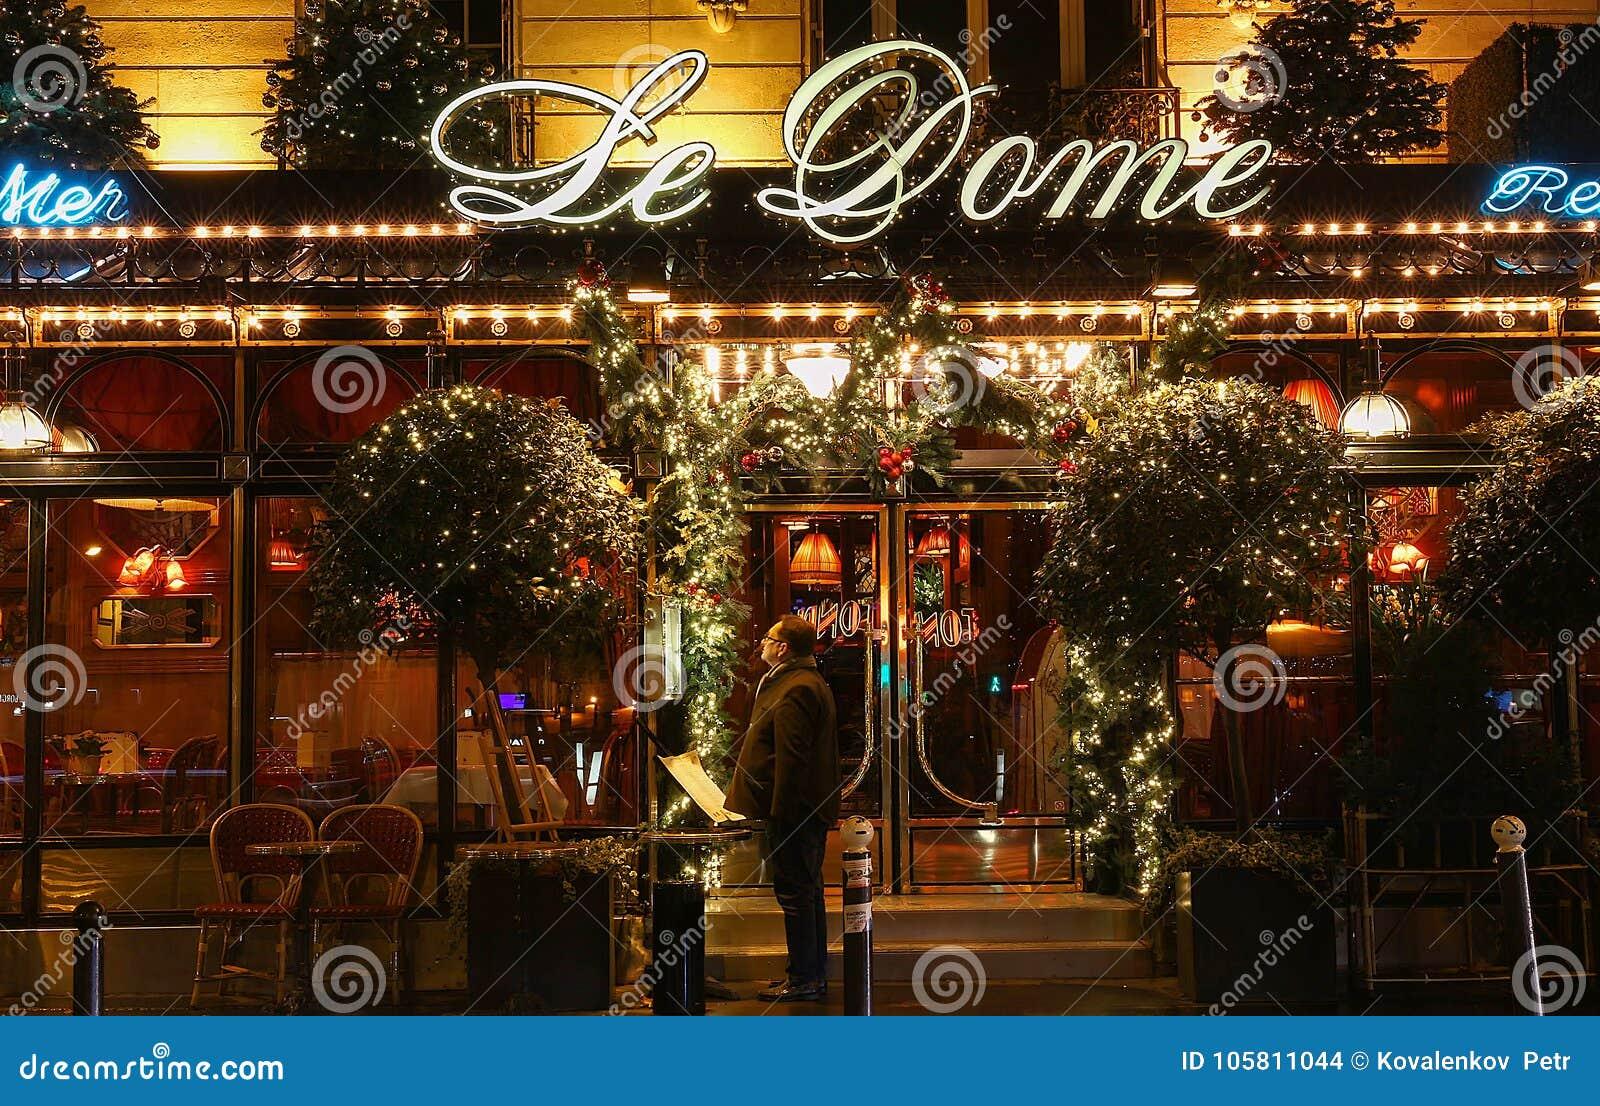 Den Beromda Restaurangen Le Kupol Dekorerade For Jul Paris Frankrike Redaktionell Fotografering For Bildbyraer Bild Av Lampa Restaurang 105811044